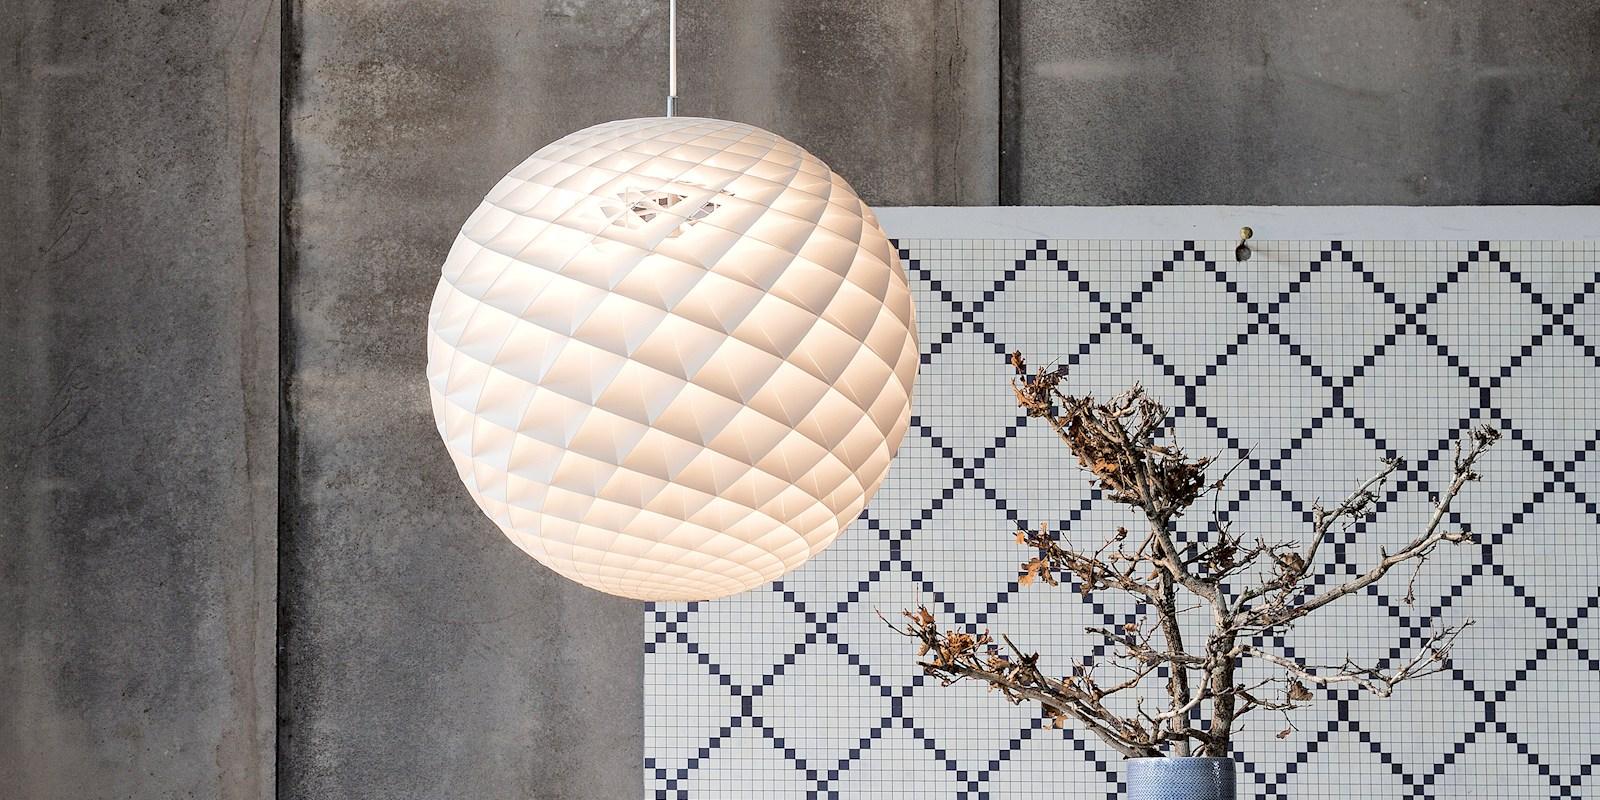 Topnotch Nye lamper denne høsten | Møbelgalleriet Stavanger | Designmøbler DF-38